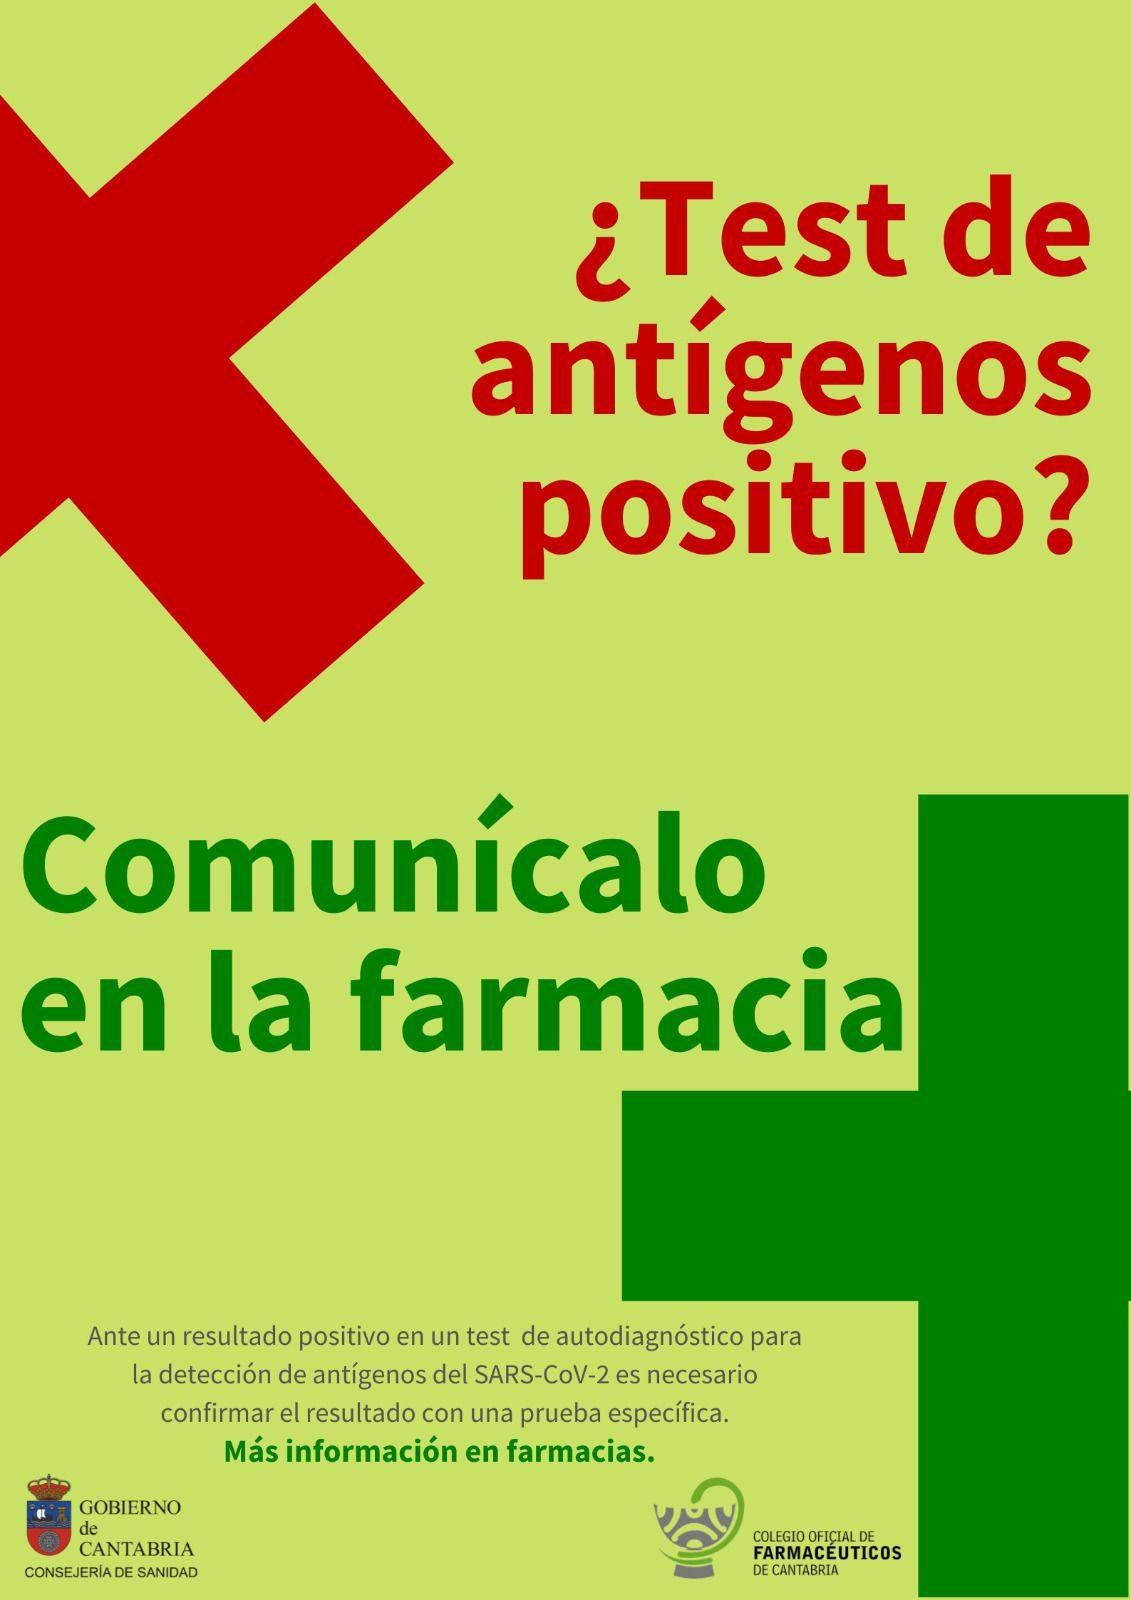 Cartel en farmacias de Cantabria.